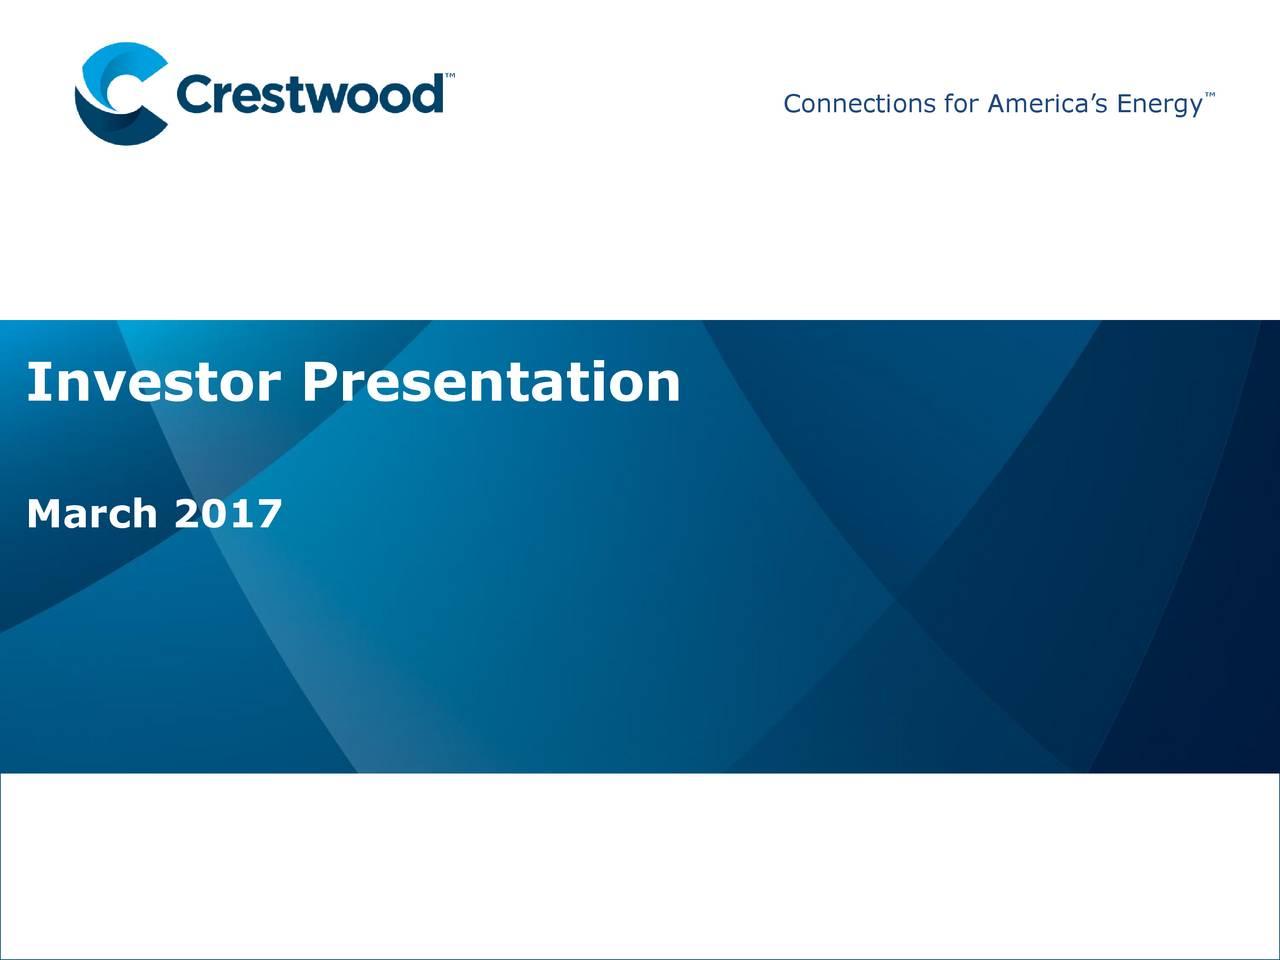 Connetons orAmercas Enegy Investor Presentation Prreesseen nttaattioonn TTi itlee March 2017nttation SSuubtttle 2/26/2017 CretwoodMidsream artersLP CrstwoodEqutyParnersLP